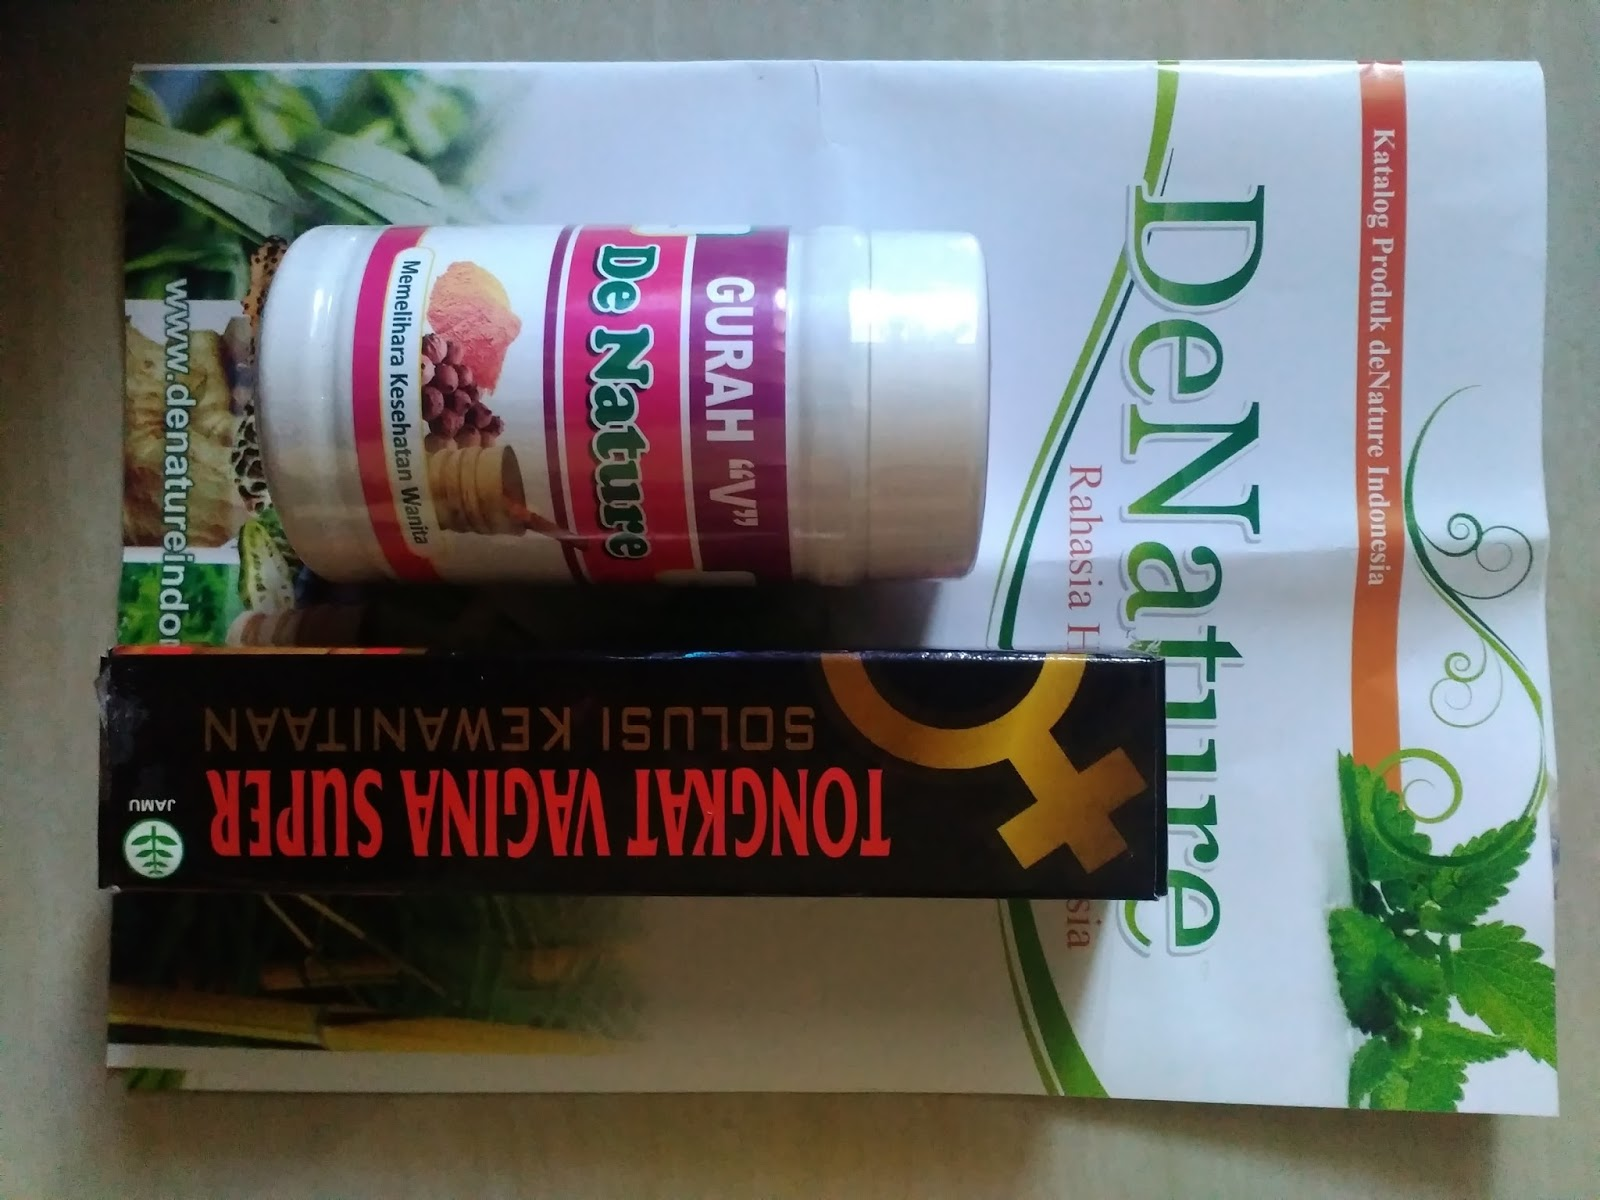 obat tradisional keputihan bau